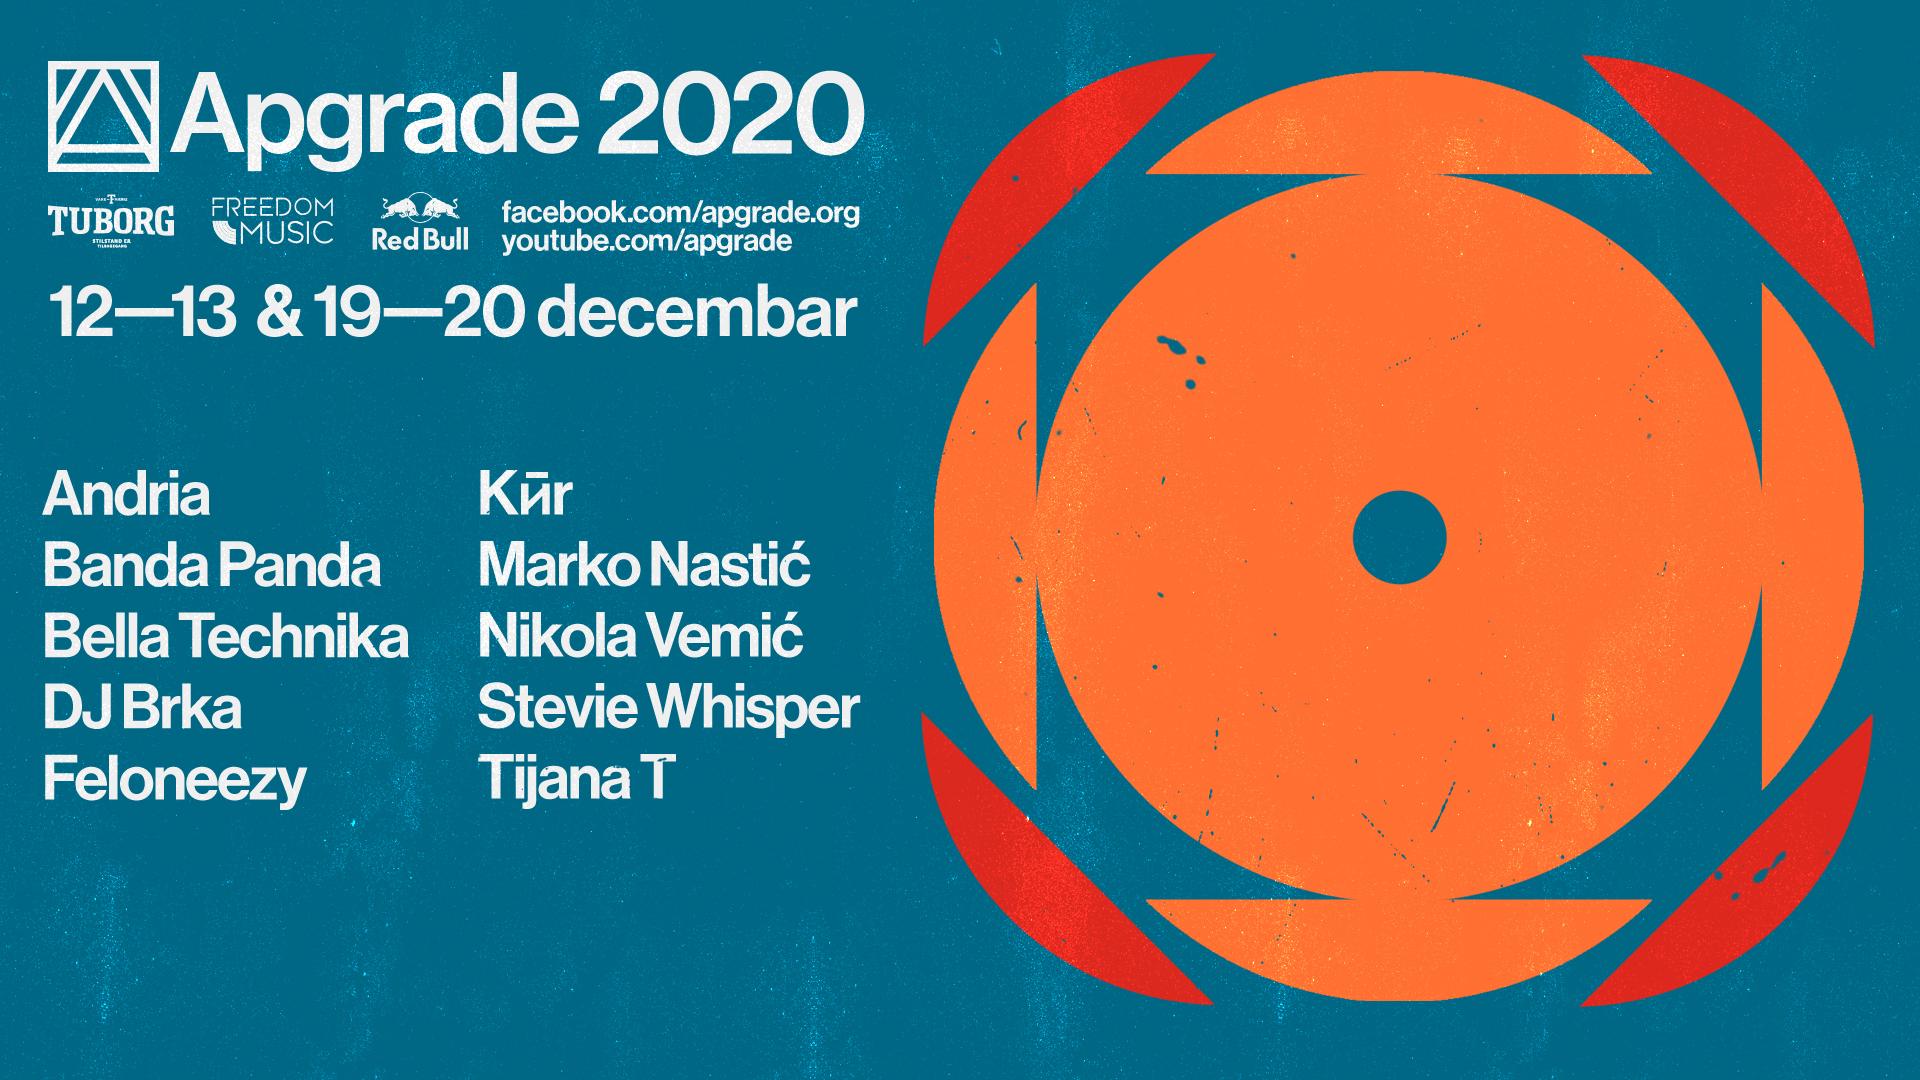 Apgrade 2020 Online